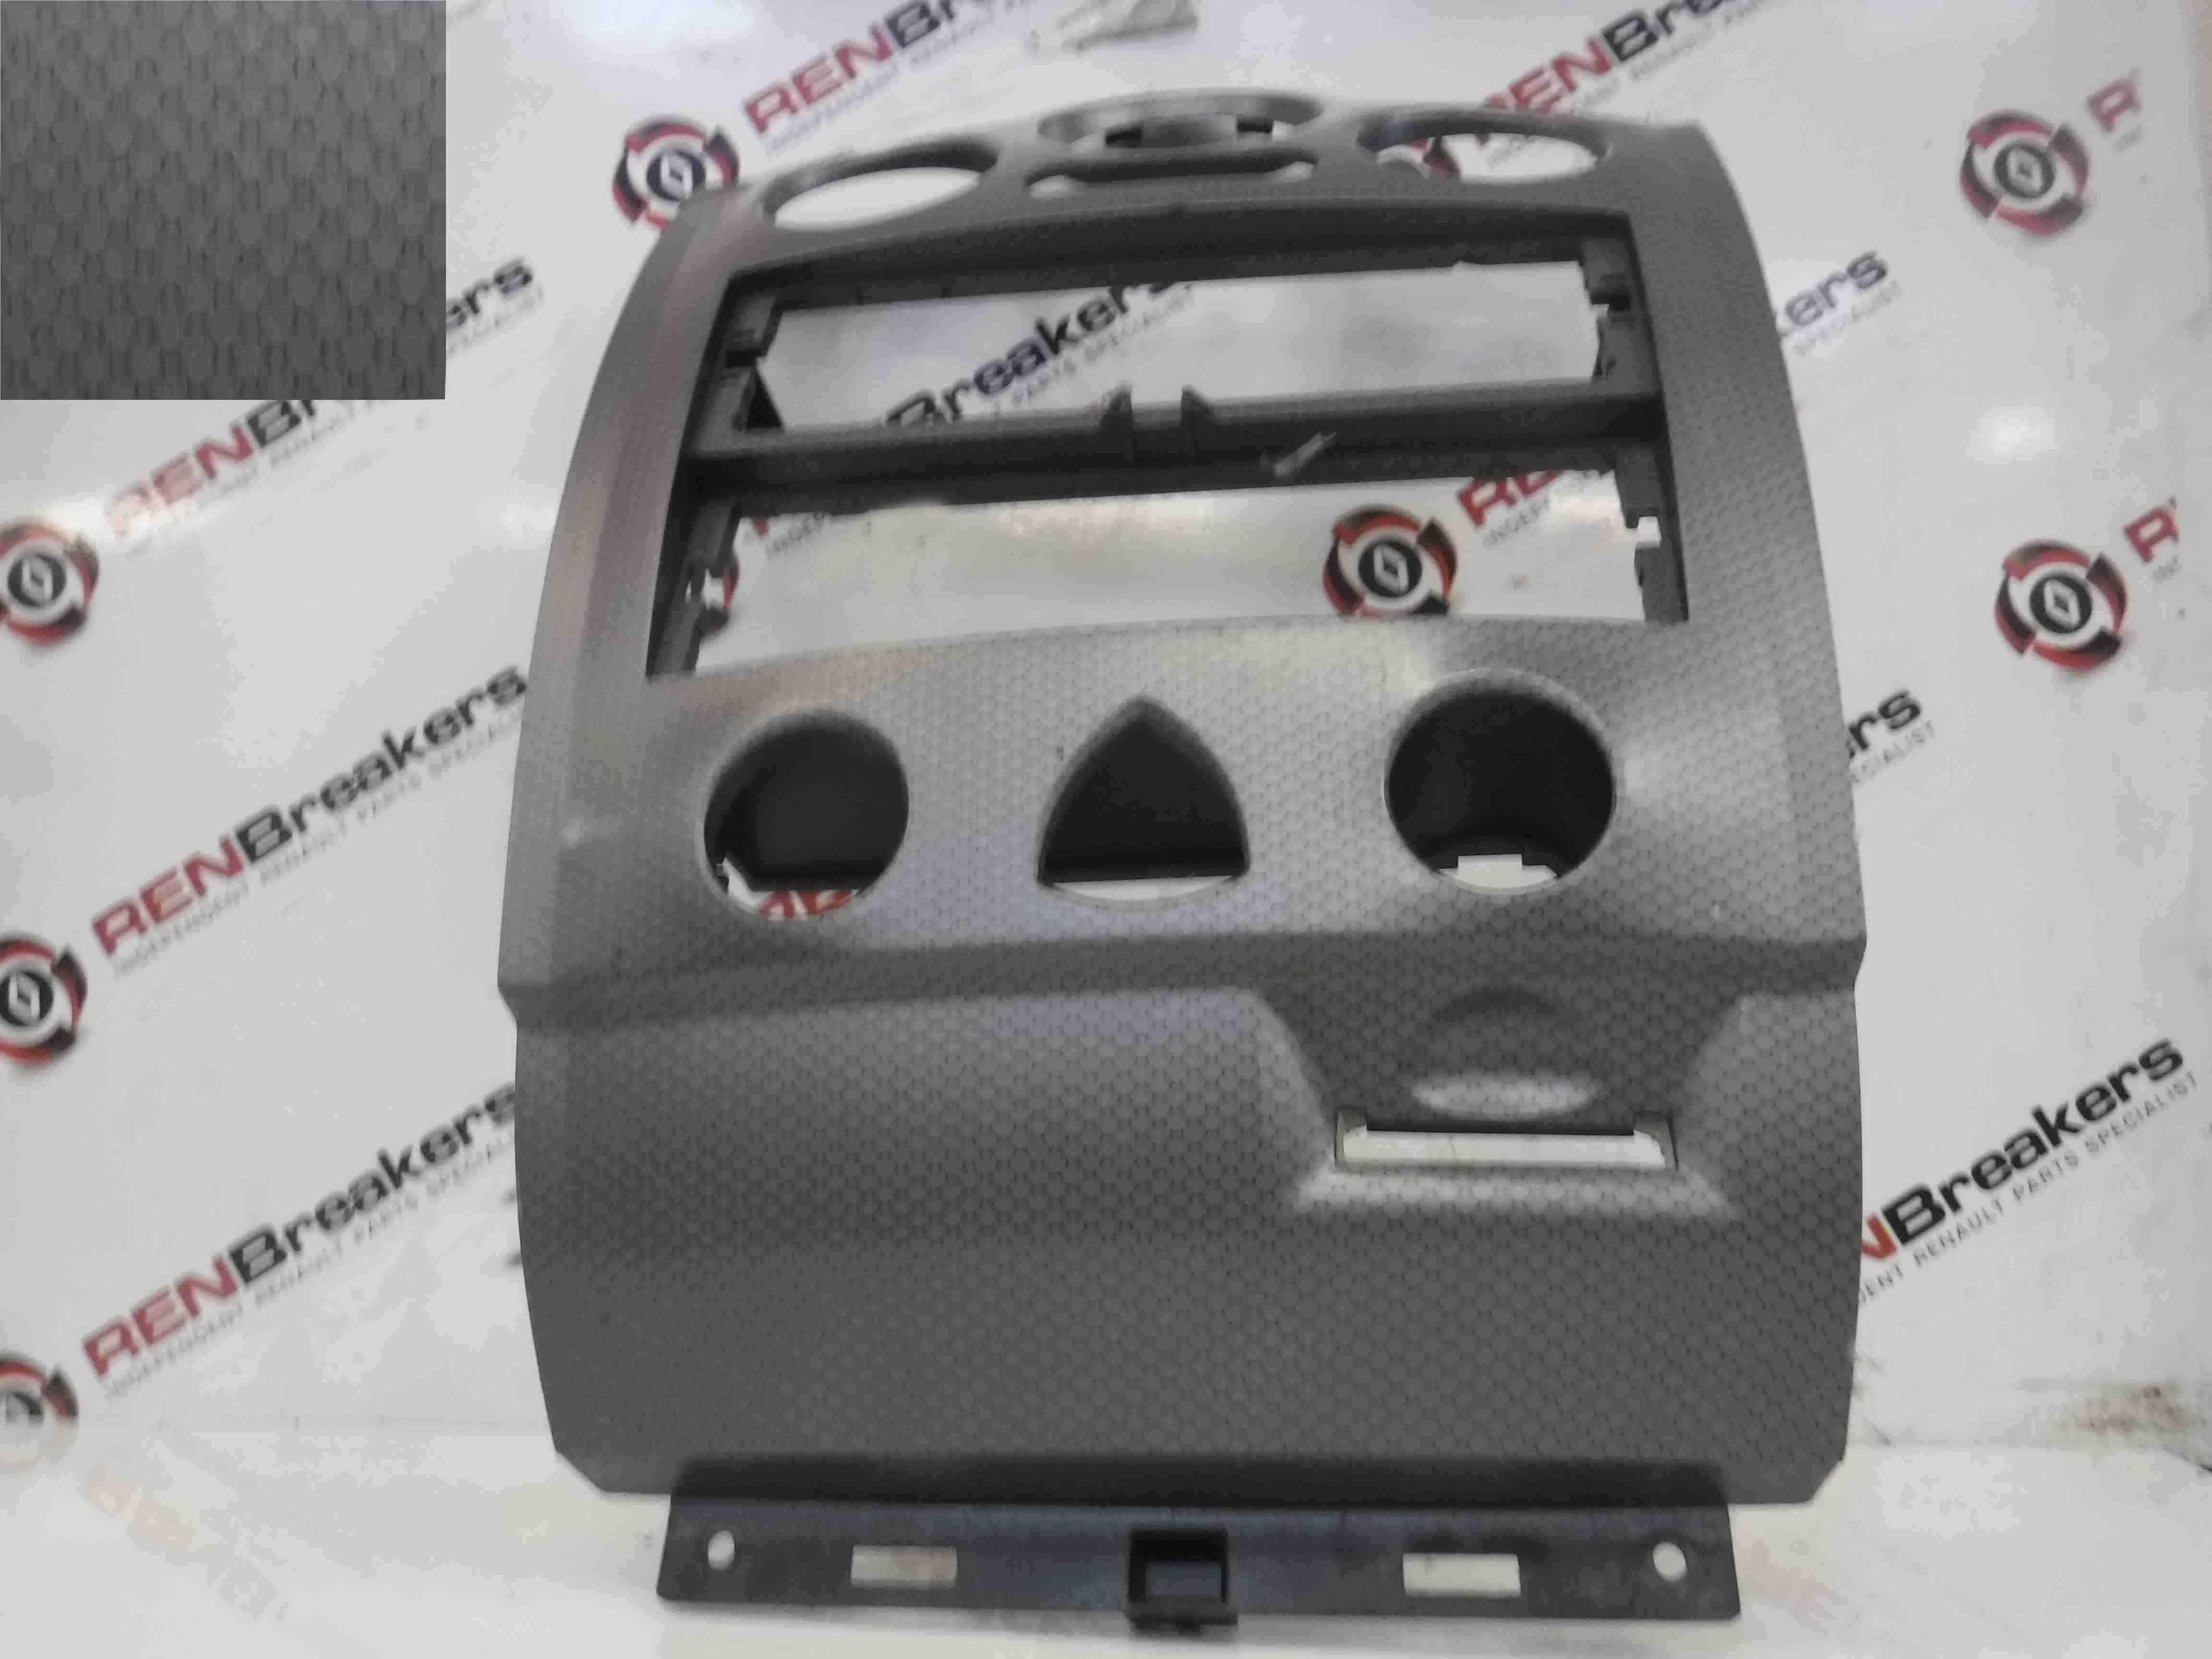 Renault Megane 2002-2008 Centre Dashboard Heater Controls Surround 8200178690